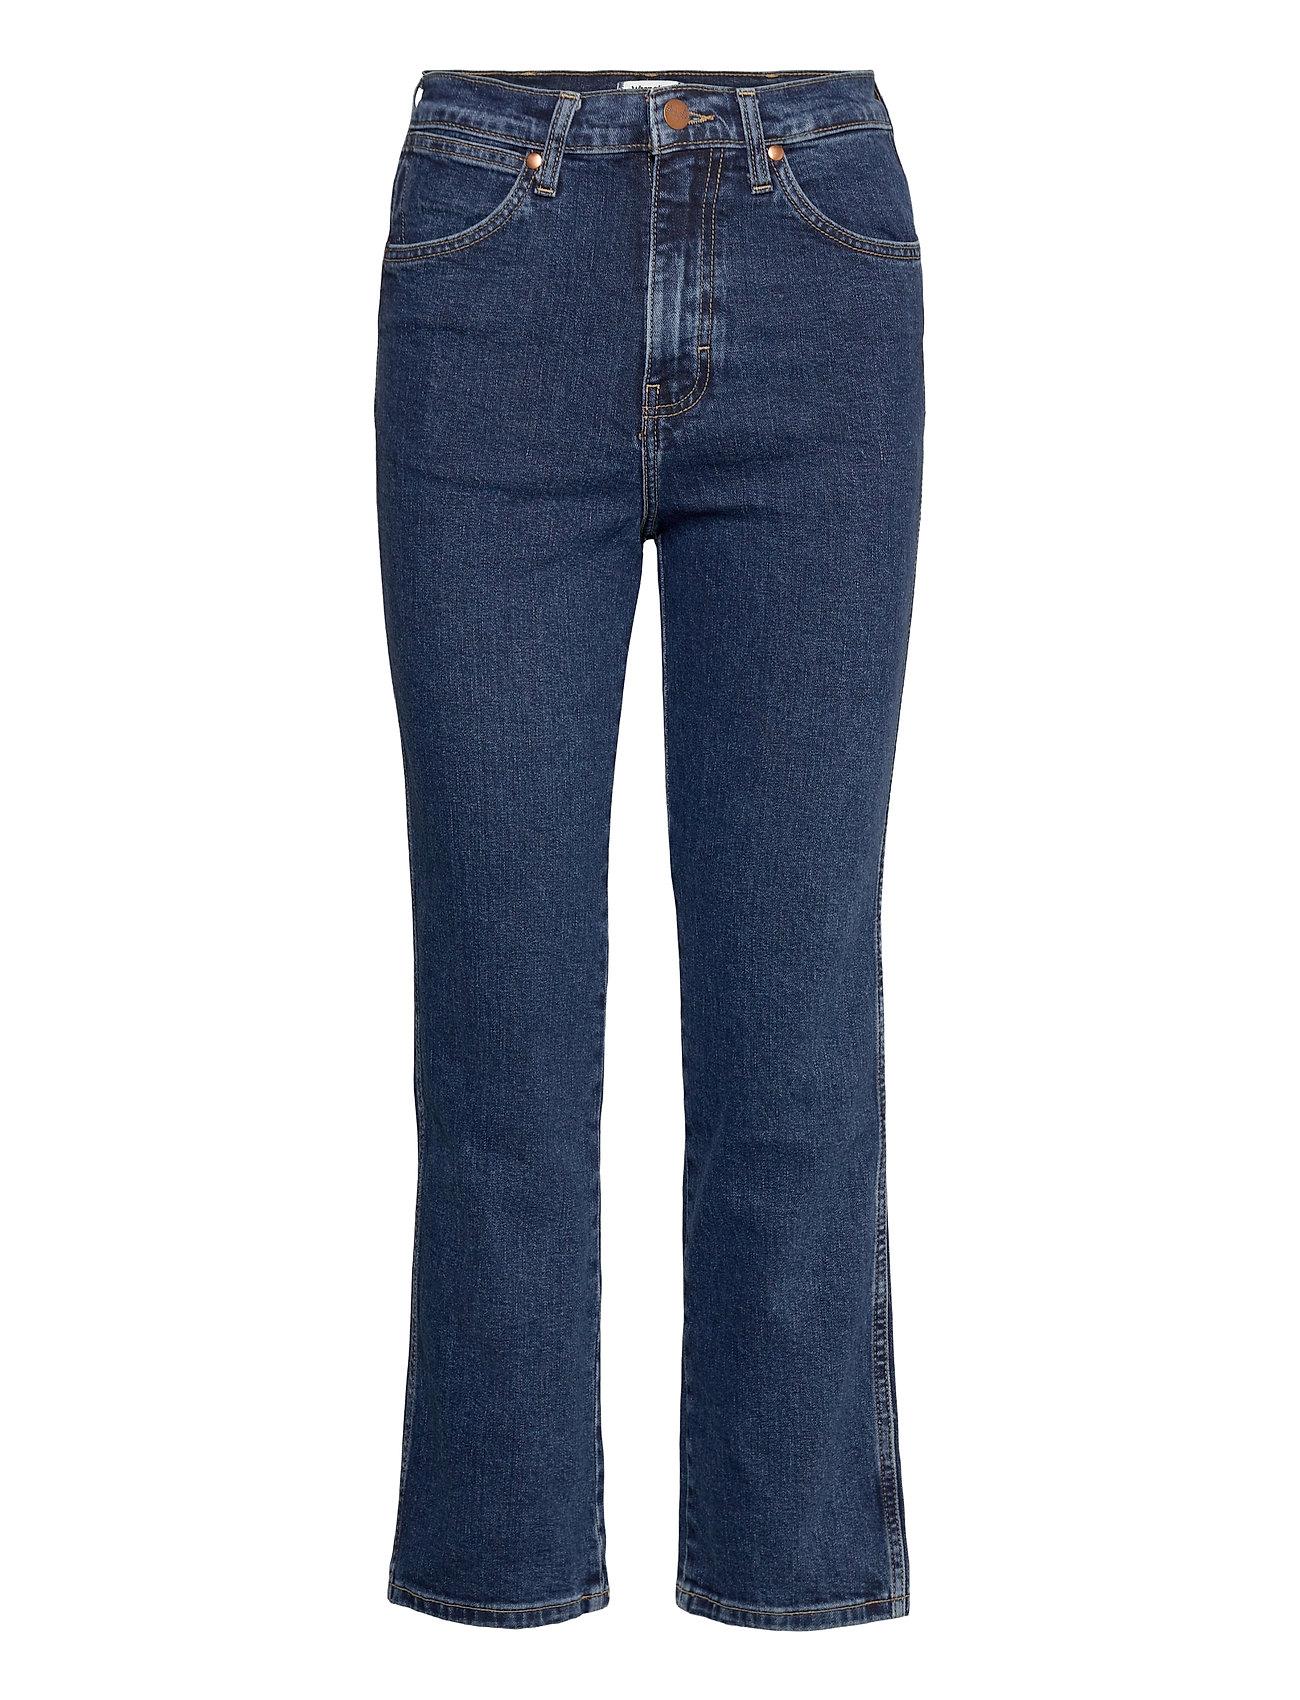 Image of Wild West Vide Jeans Blå Wrangler (3458926051)